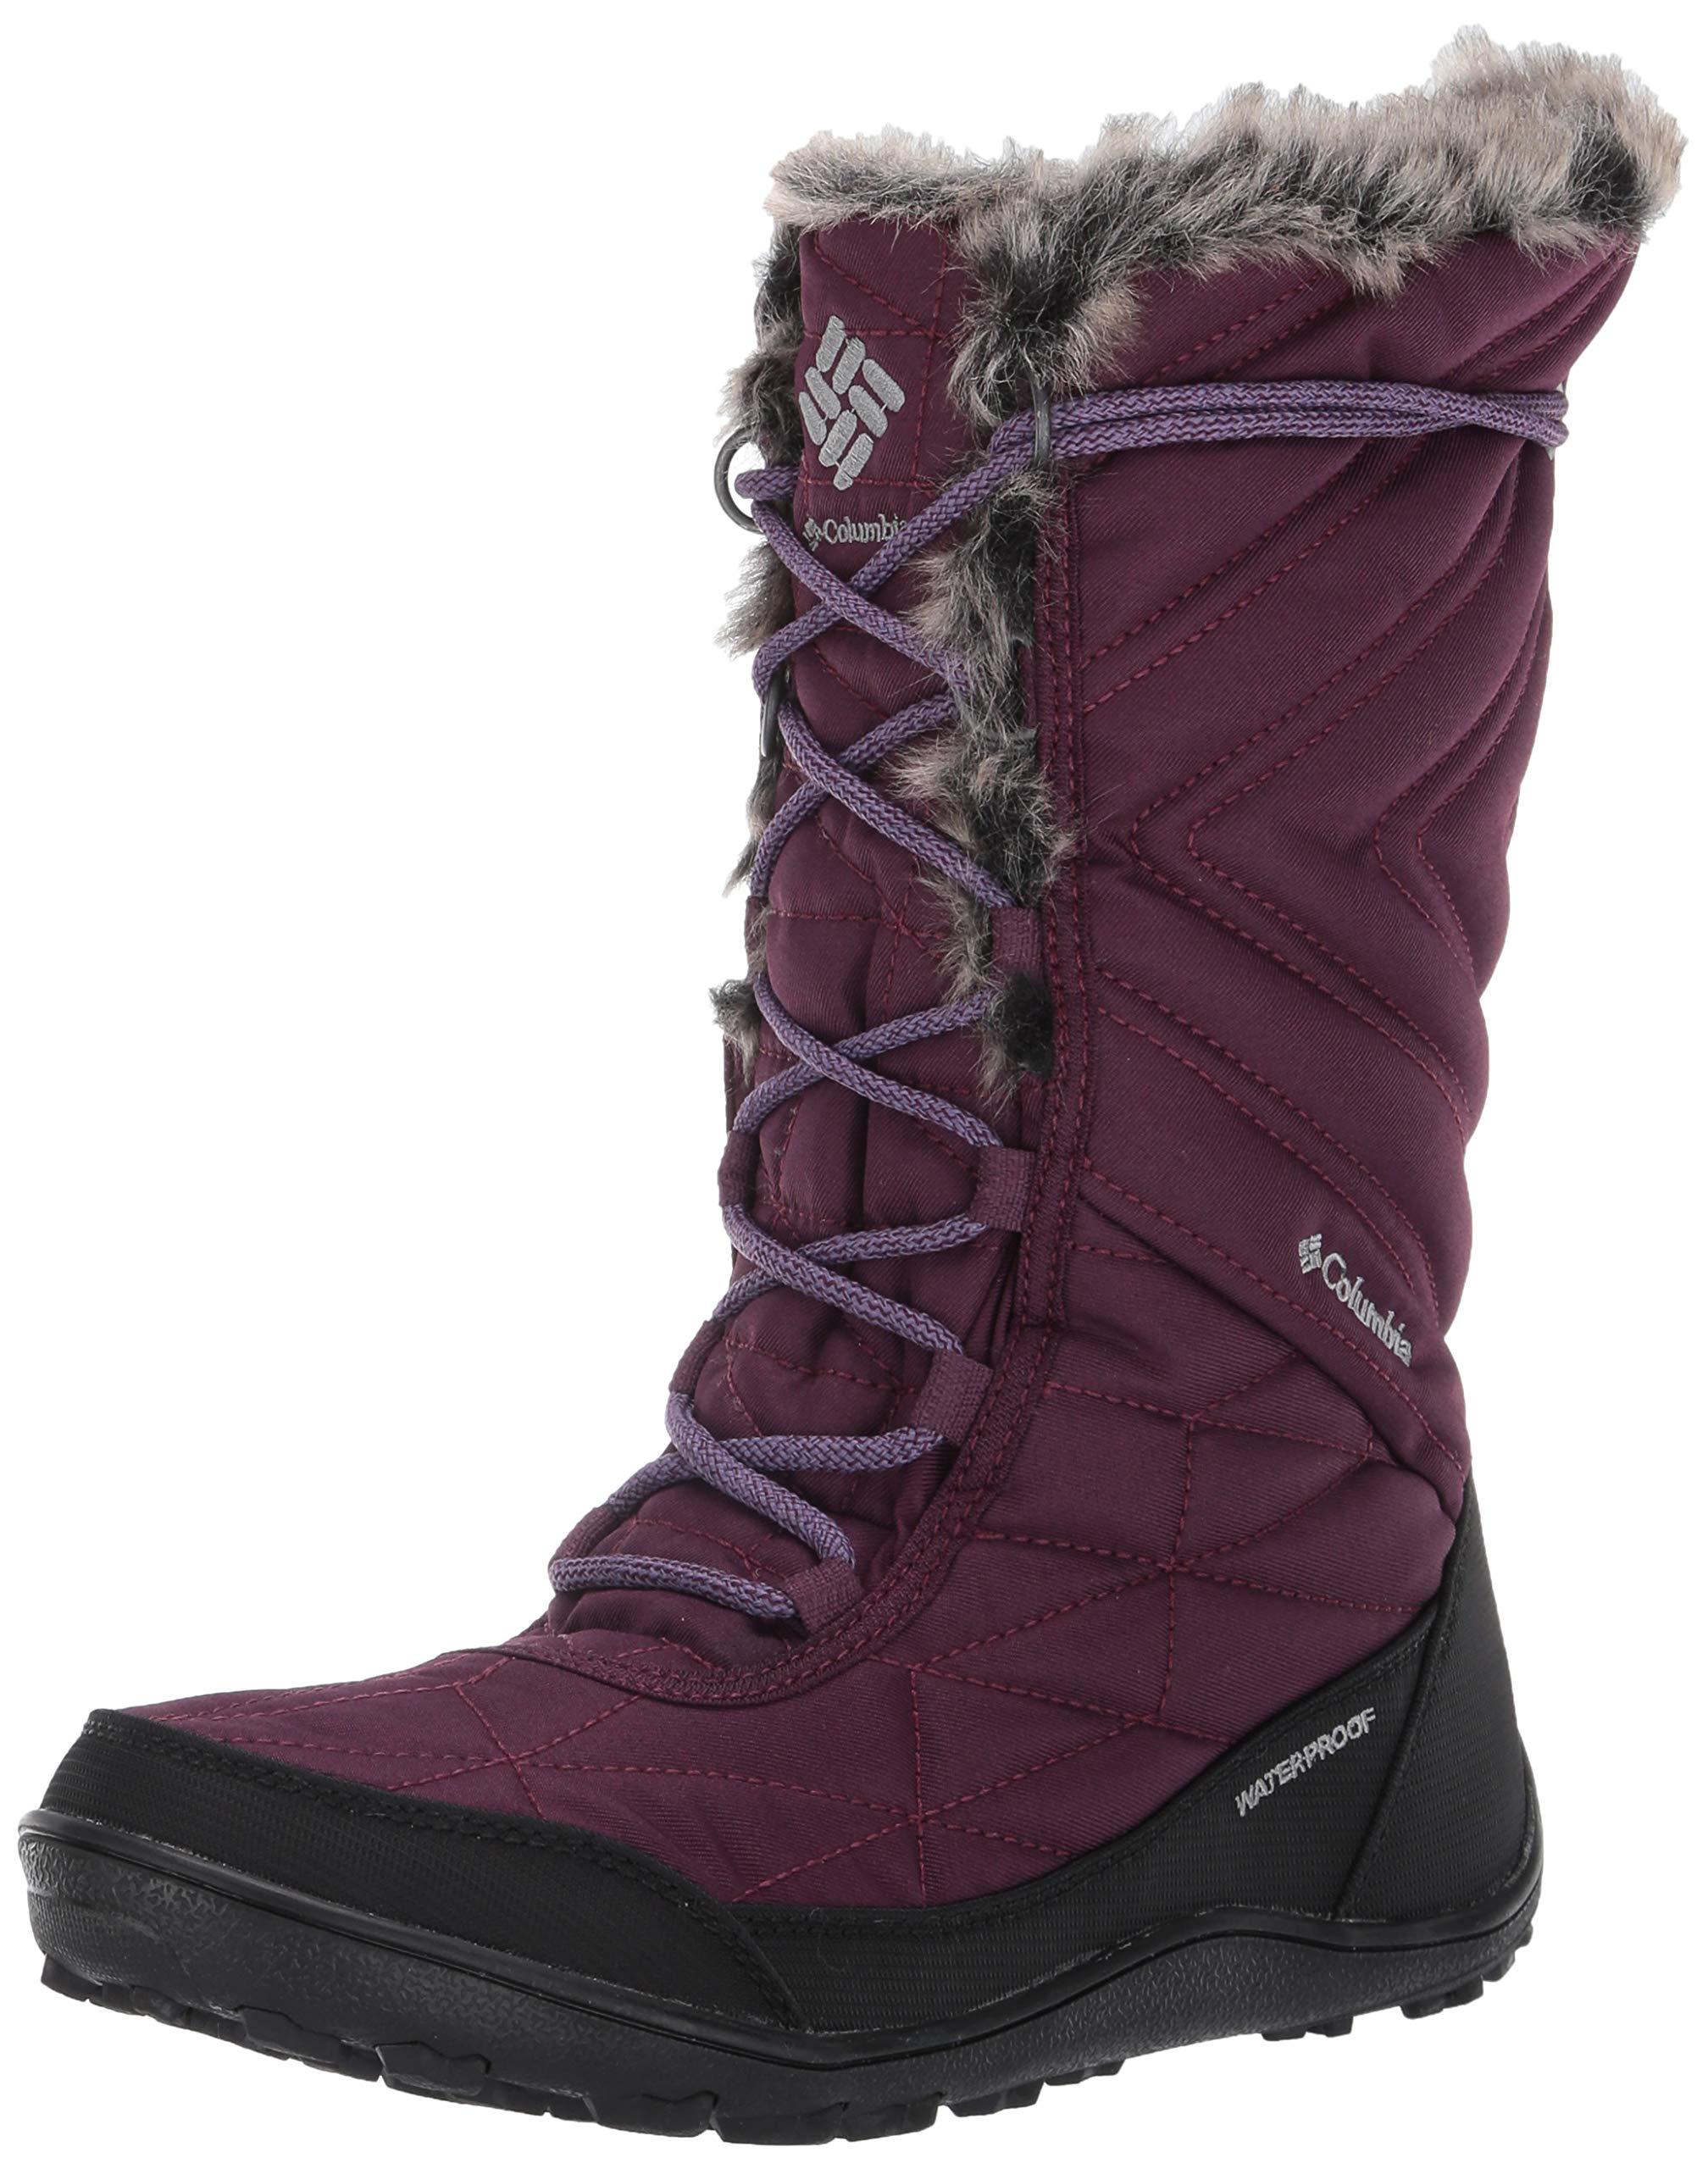 Columbia Women's Minx MID III Snow Boot, Black Cherry, Plum Purple, 9.5 Regular US by Columbia